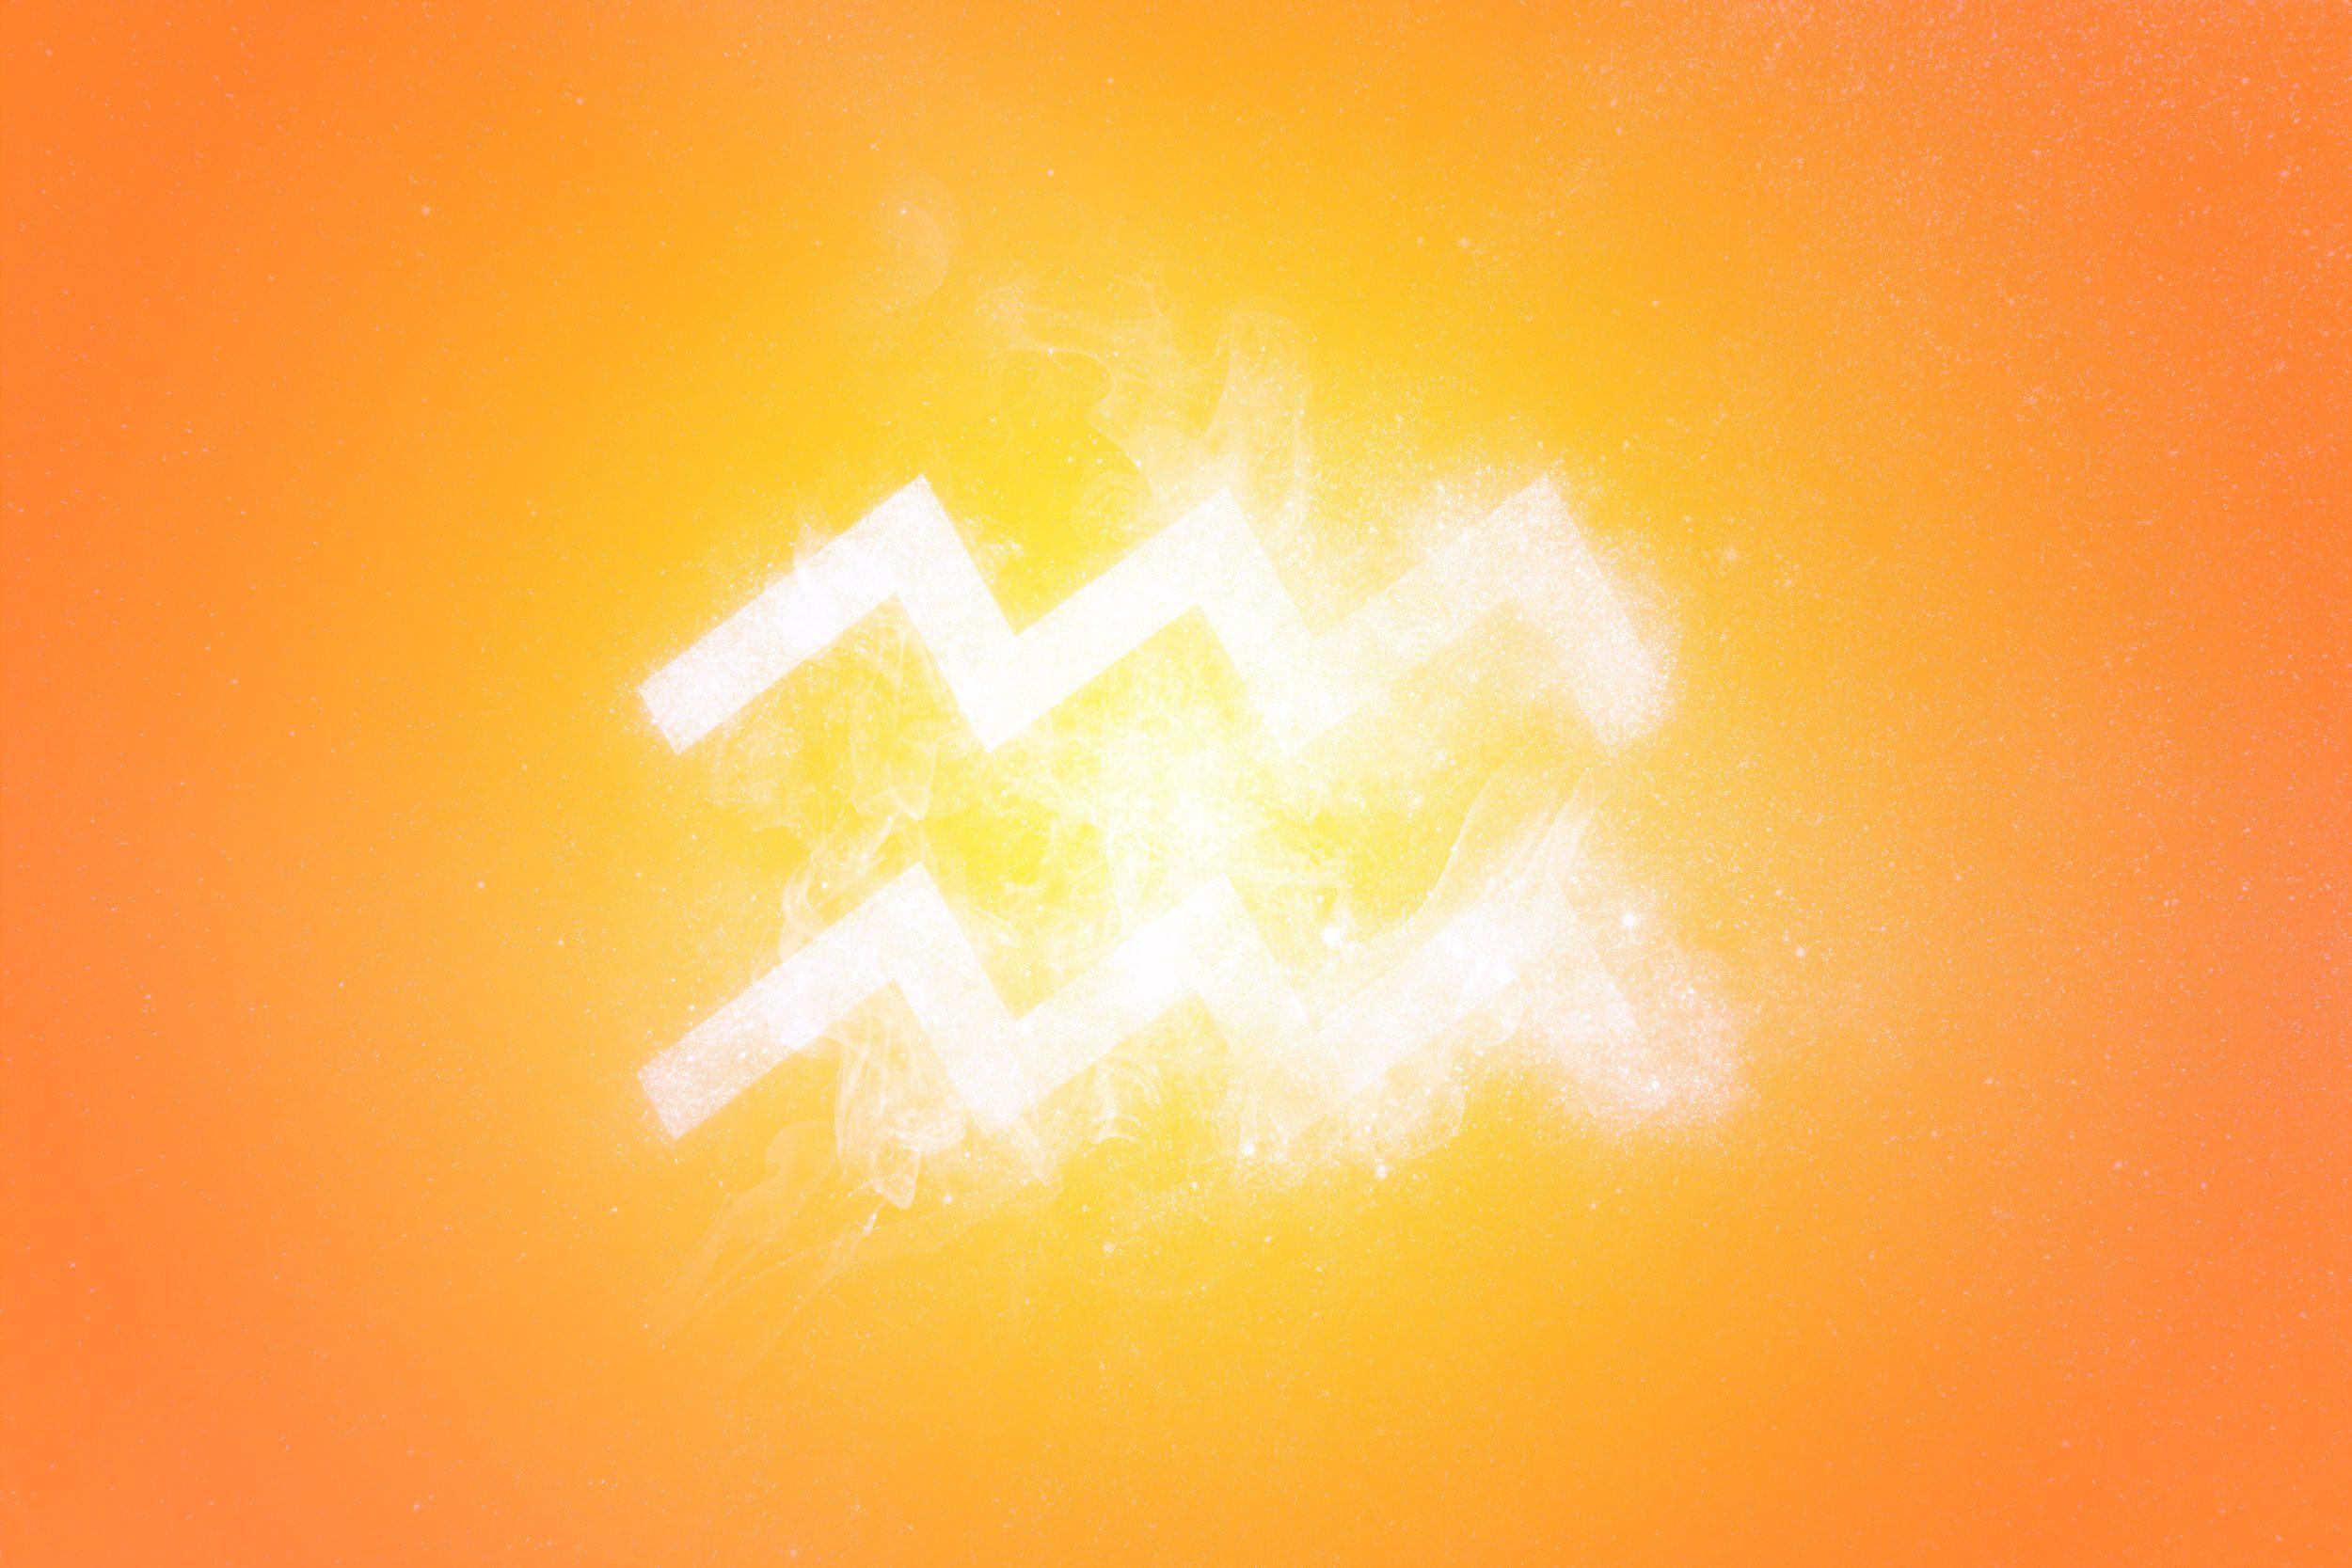 Aquarius Zodiac Sign. Abstract sky background